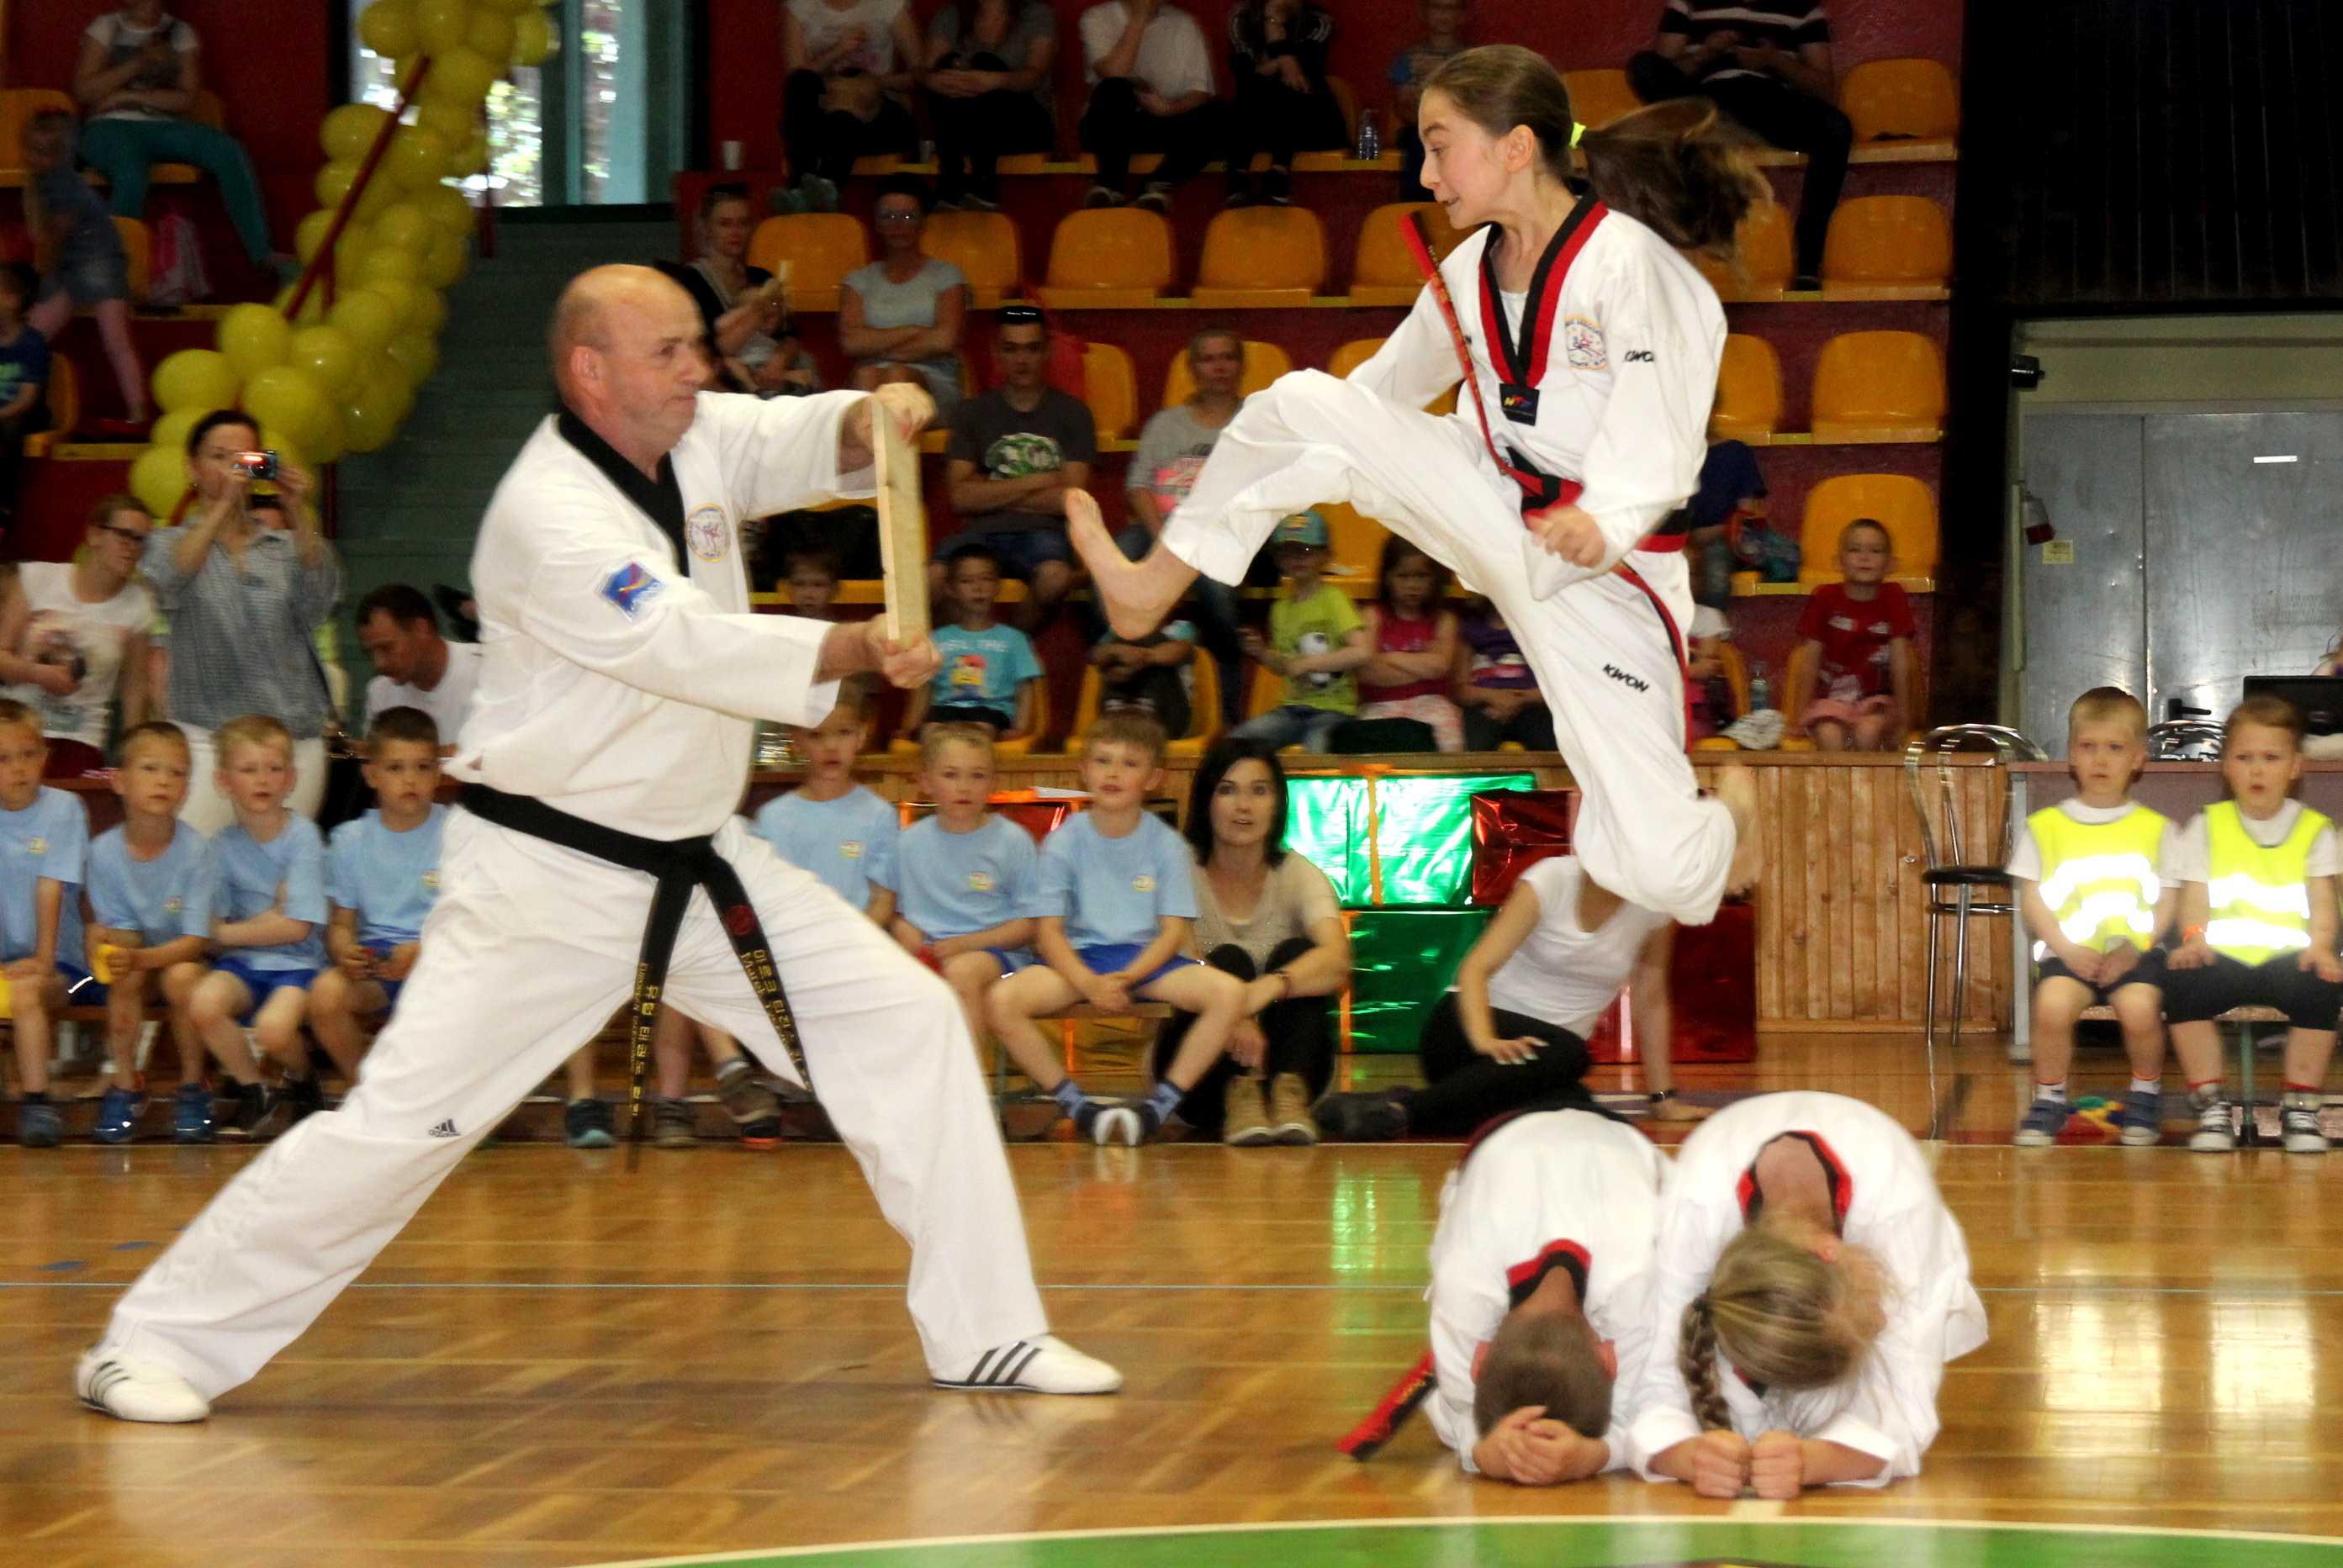 092-olimpiada (117)